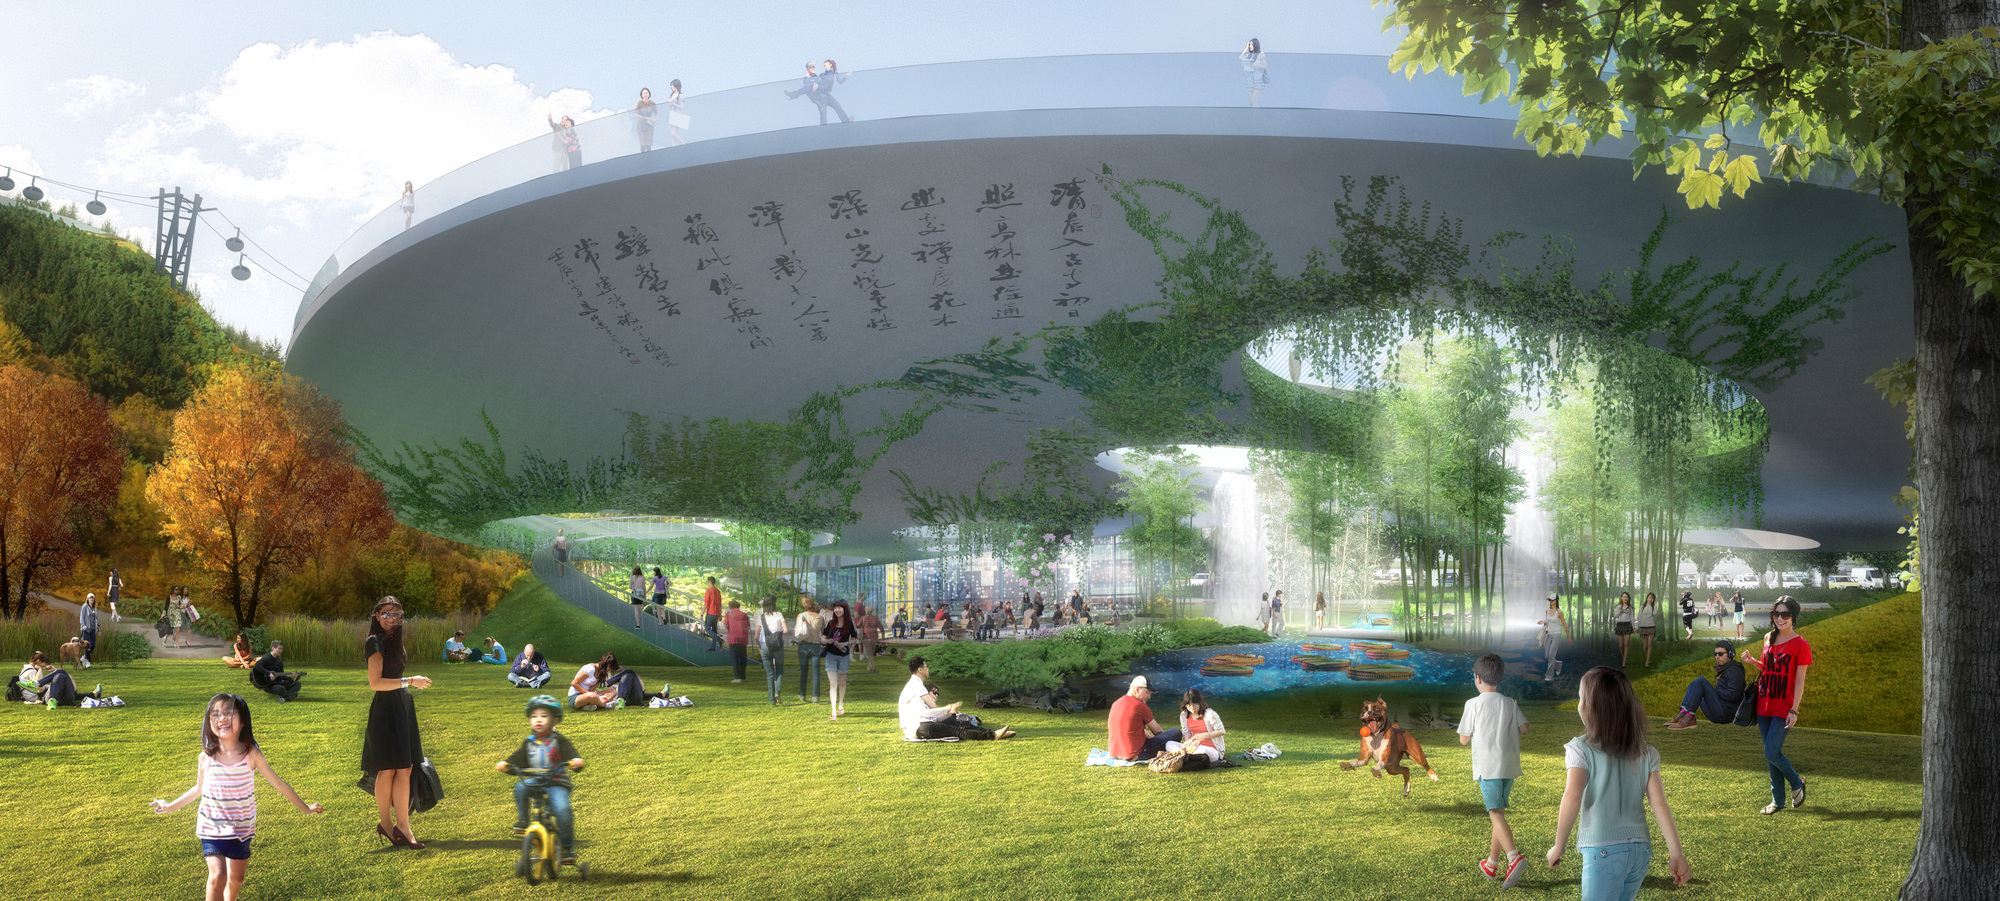 Urban Ecosystem Design Named Winner of Lion Mountain Park ...